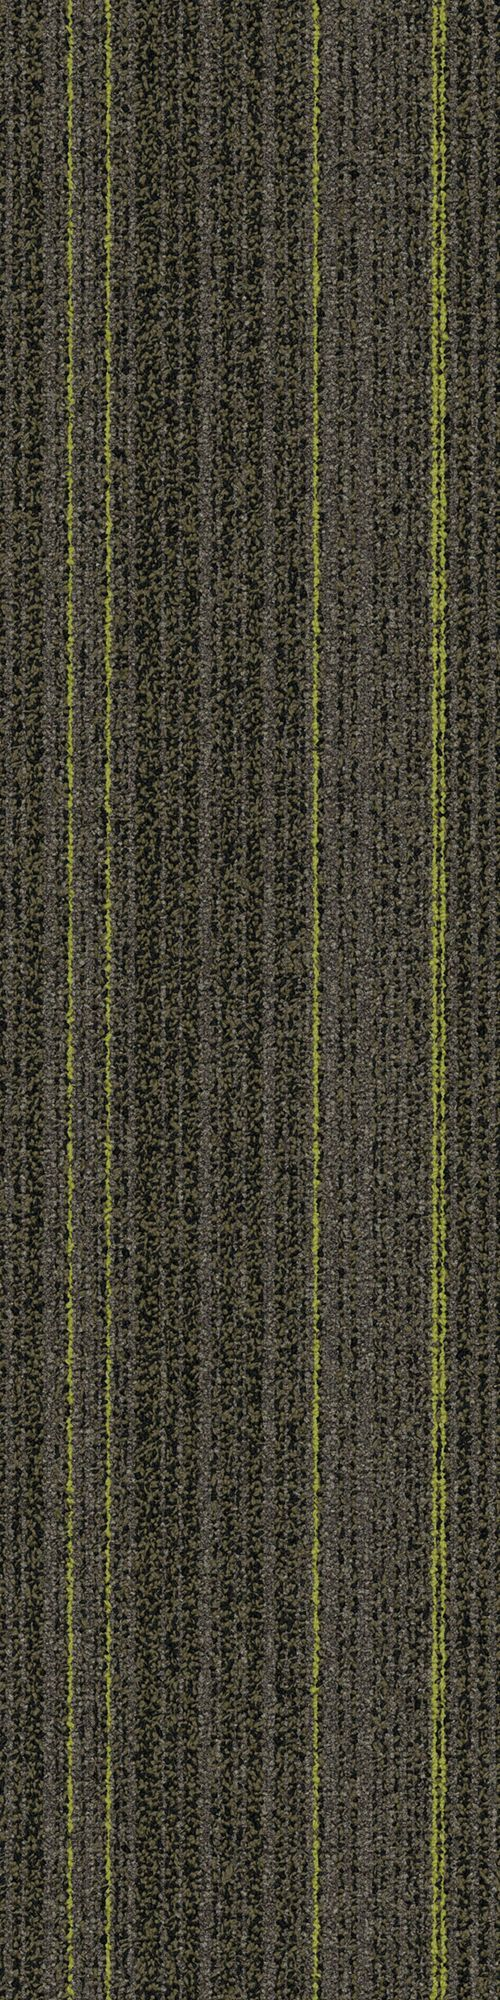 17 best bike path by interface images on pinterest paths carpet interface carpet tile bp411 color name oreganolime variant 8 baanklon Gallery